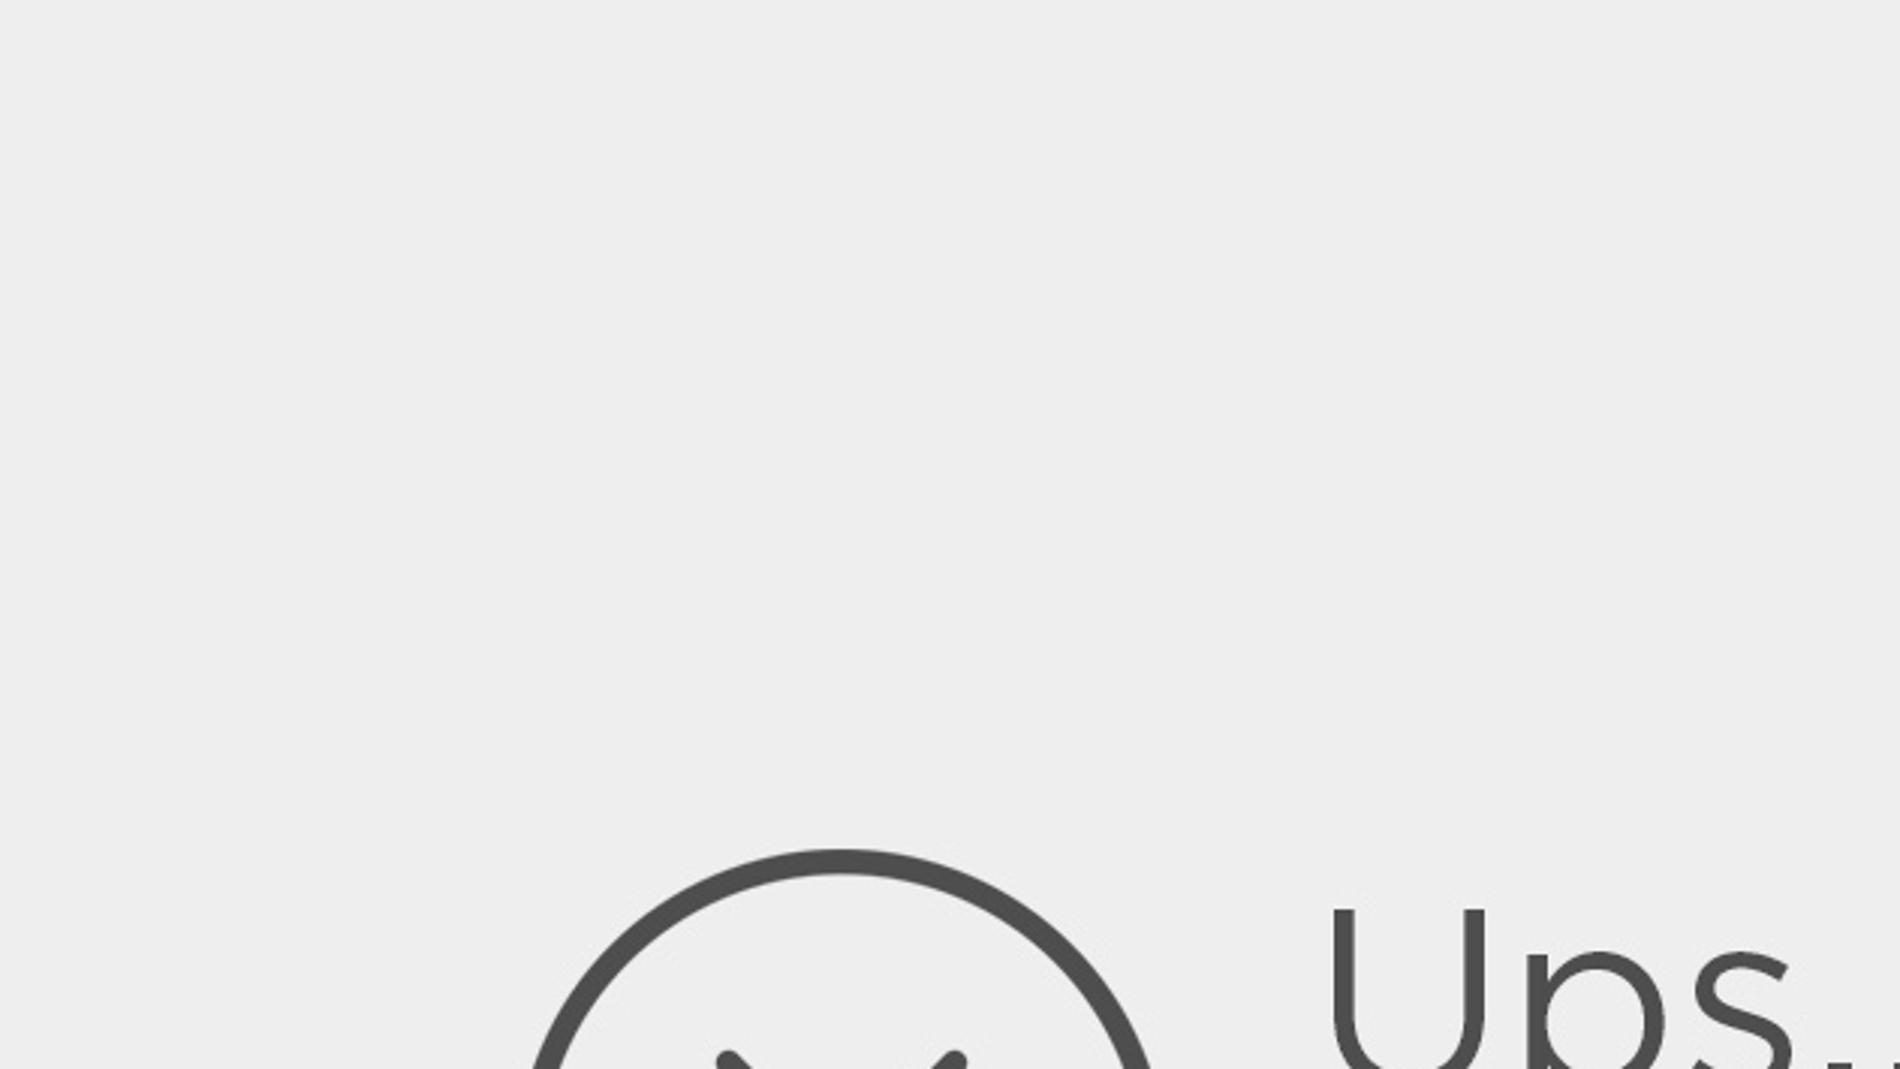 Kristen Wiig, Melissa McCarthy, Kate McKinnon y Leslie Jones, las nuevas cazafantasmas